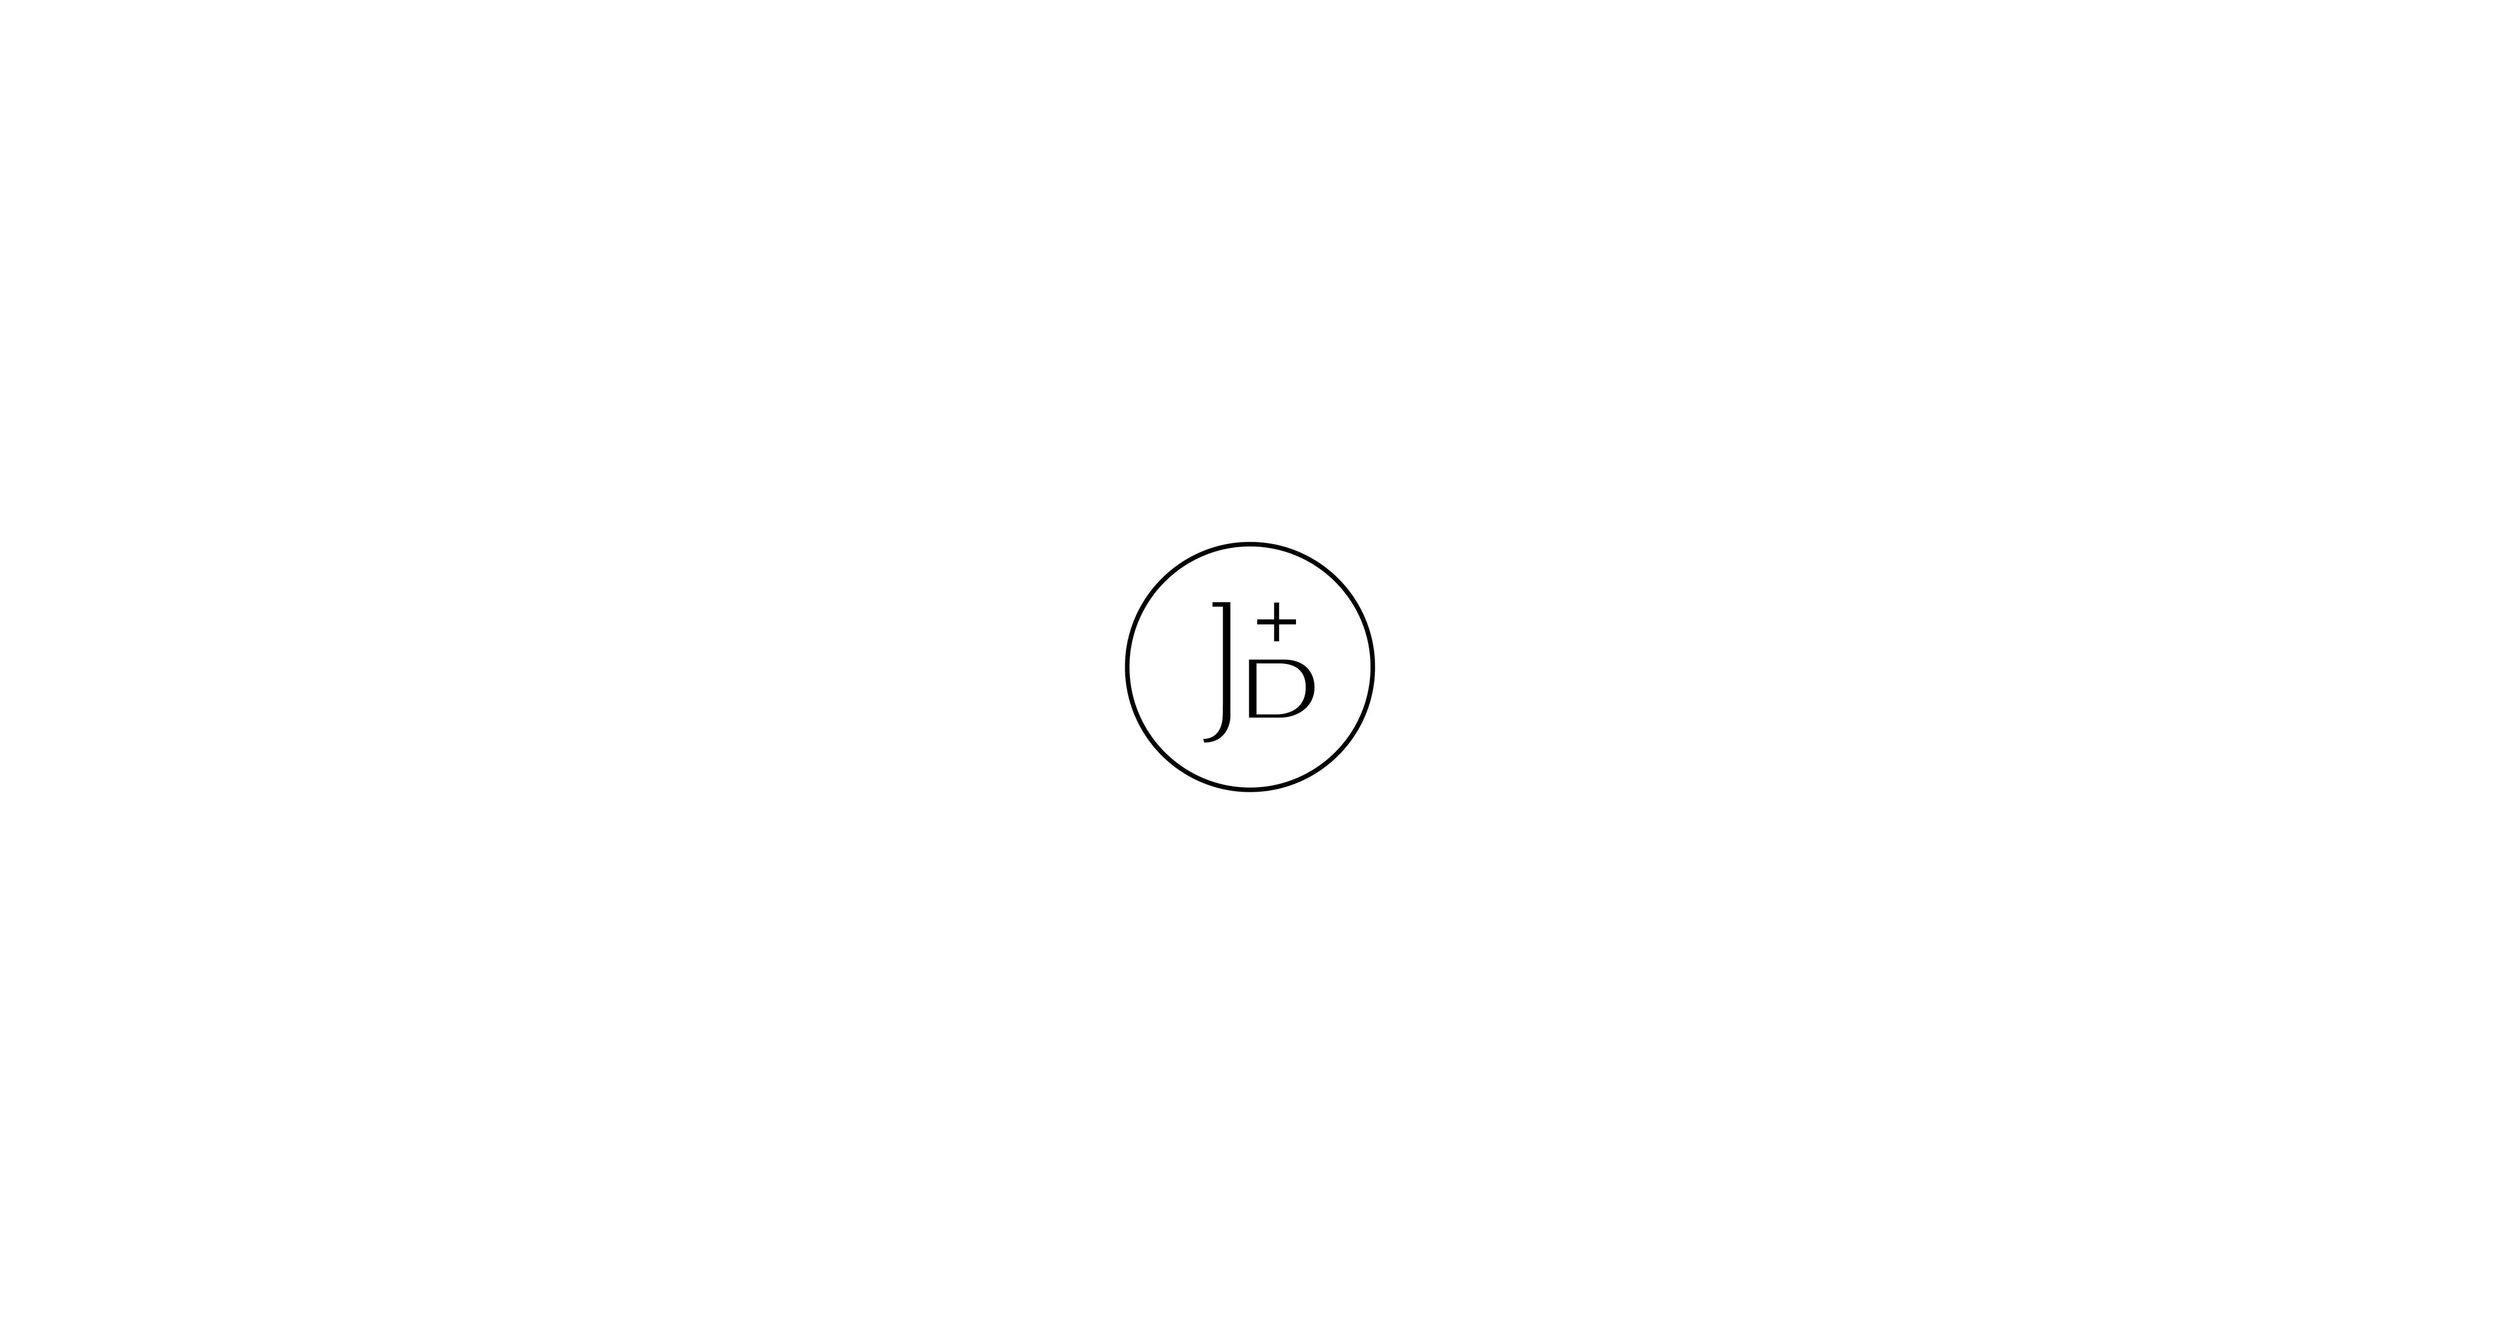 logo-design-branding-san-diego-vortic-03-jade-2